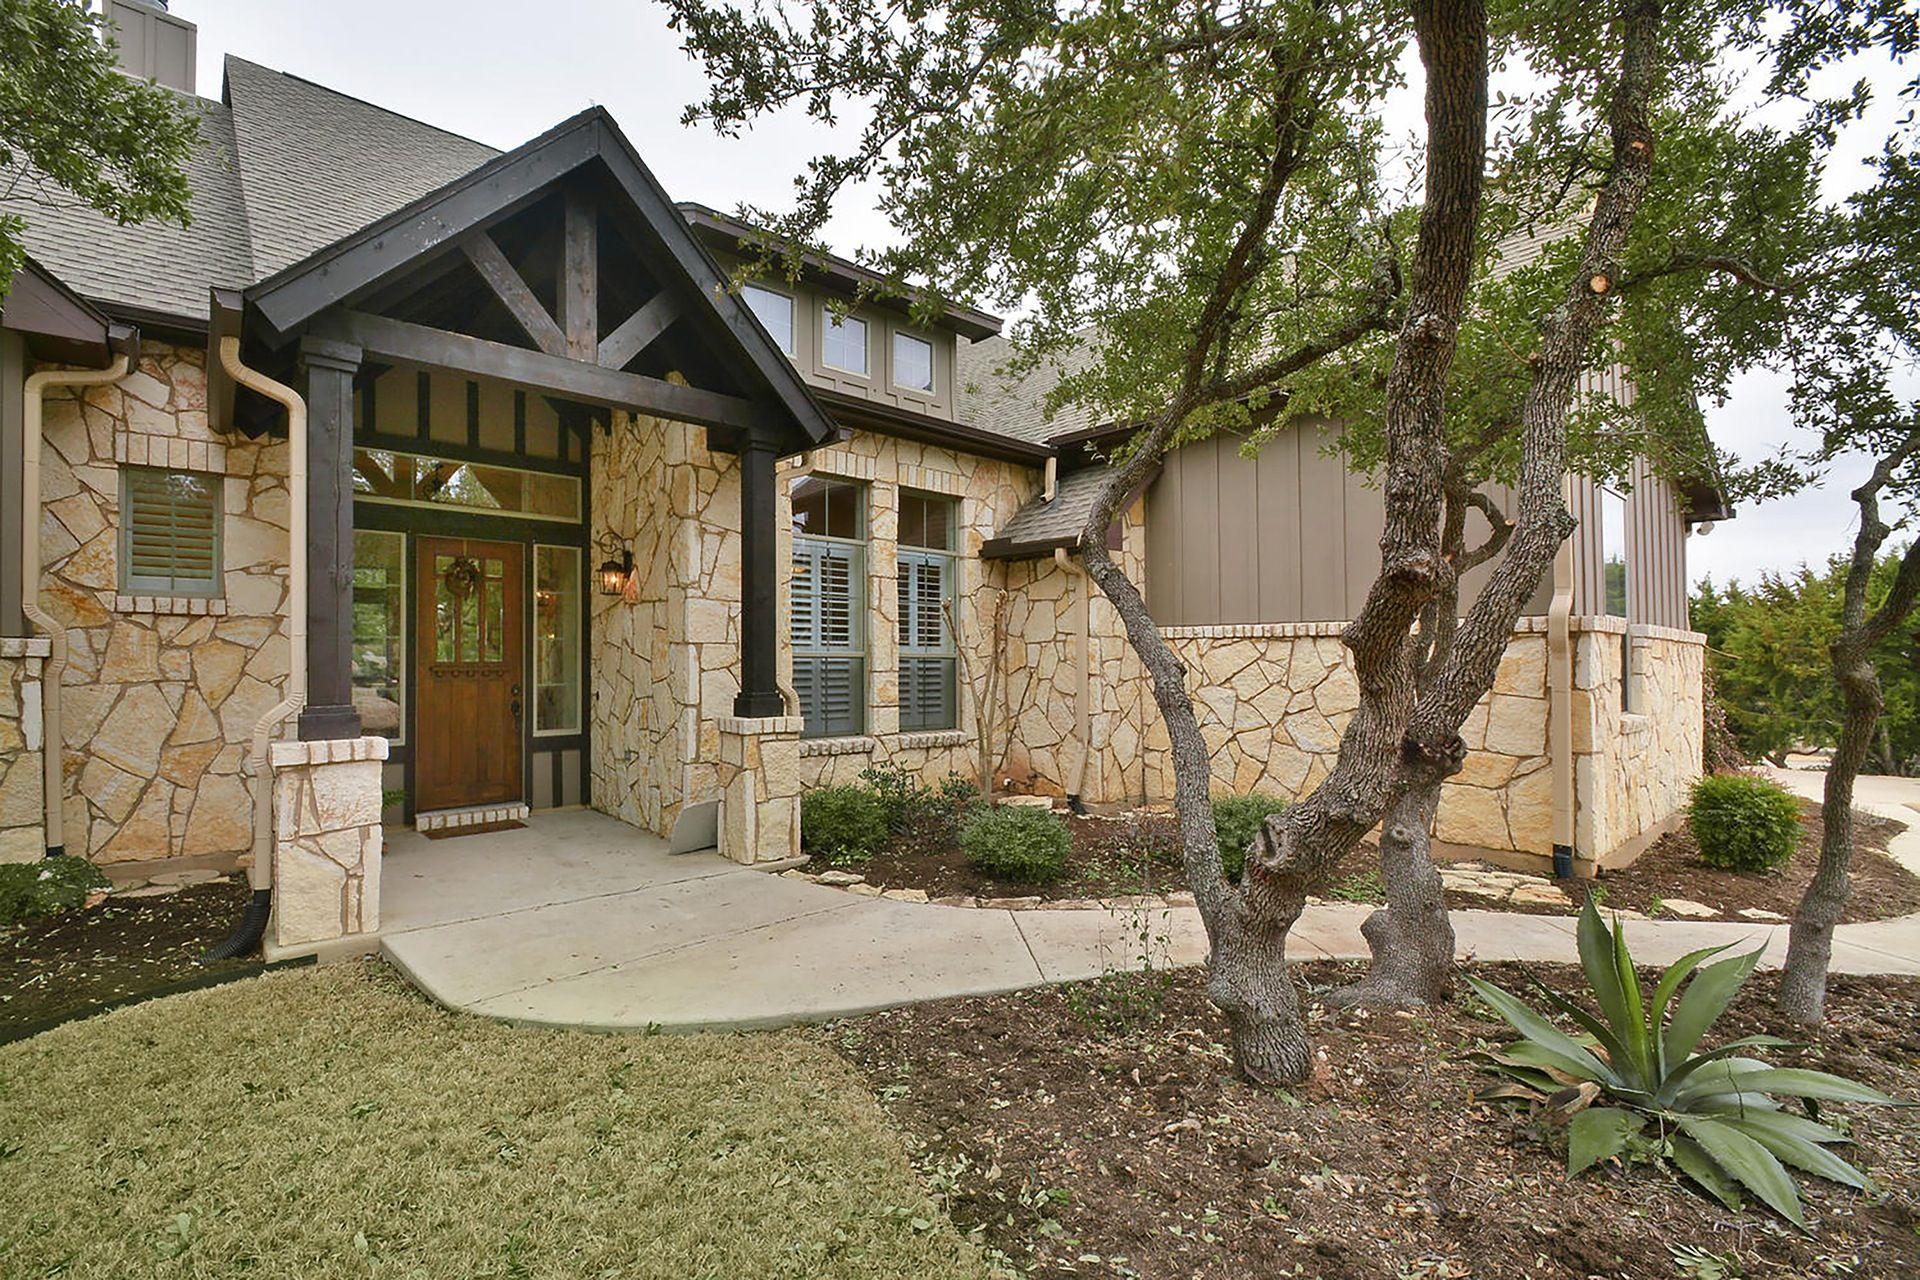 Architectural Designs Hill Country Plans. Home Decor Websites. Pinterest  Home Decor. Home Decorators